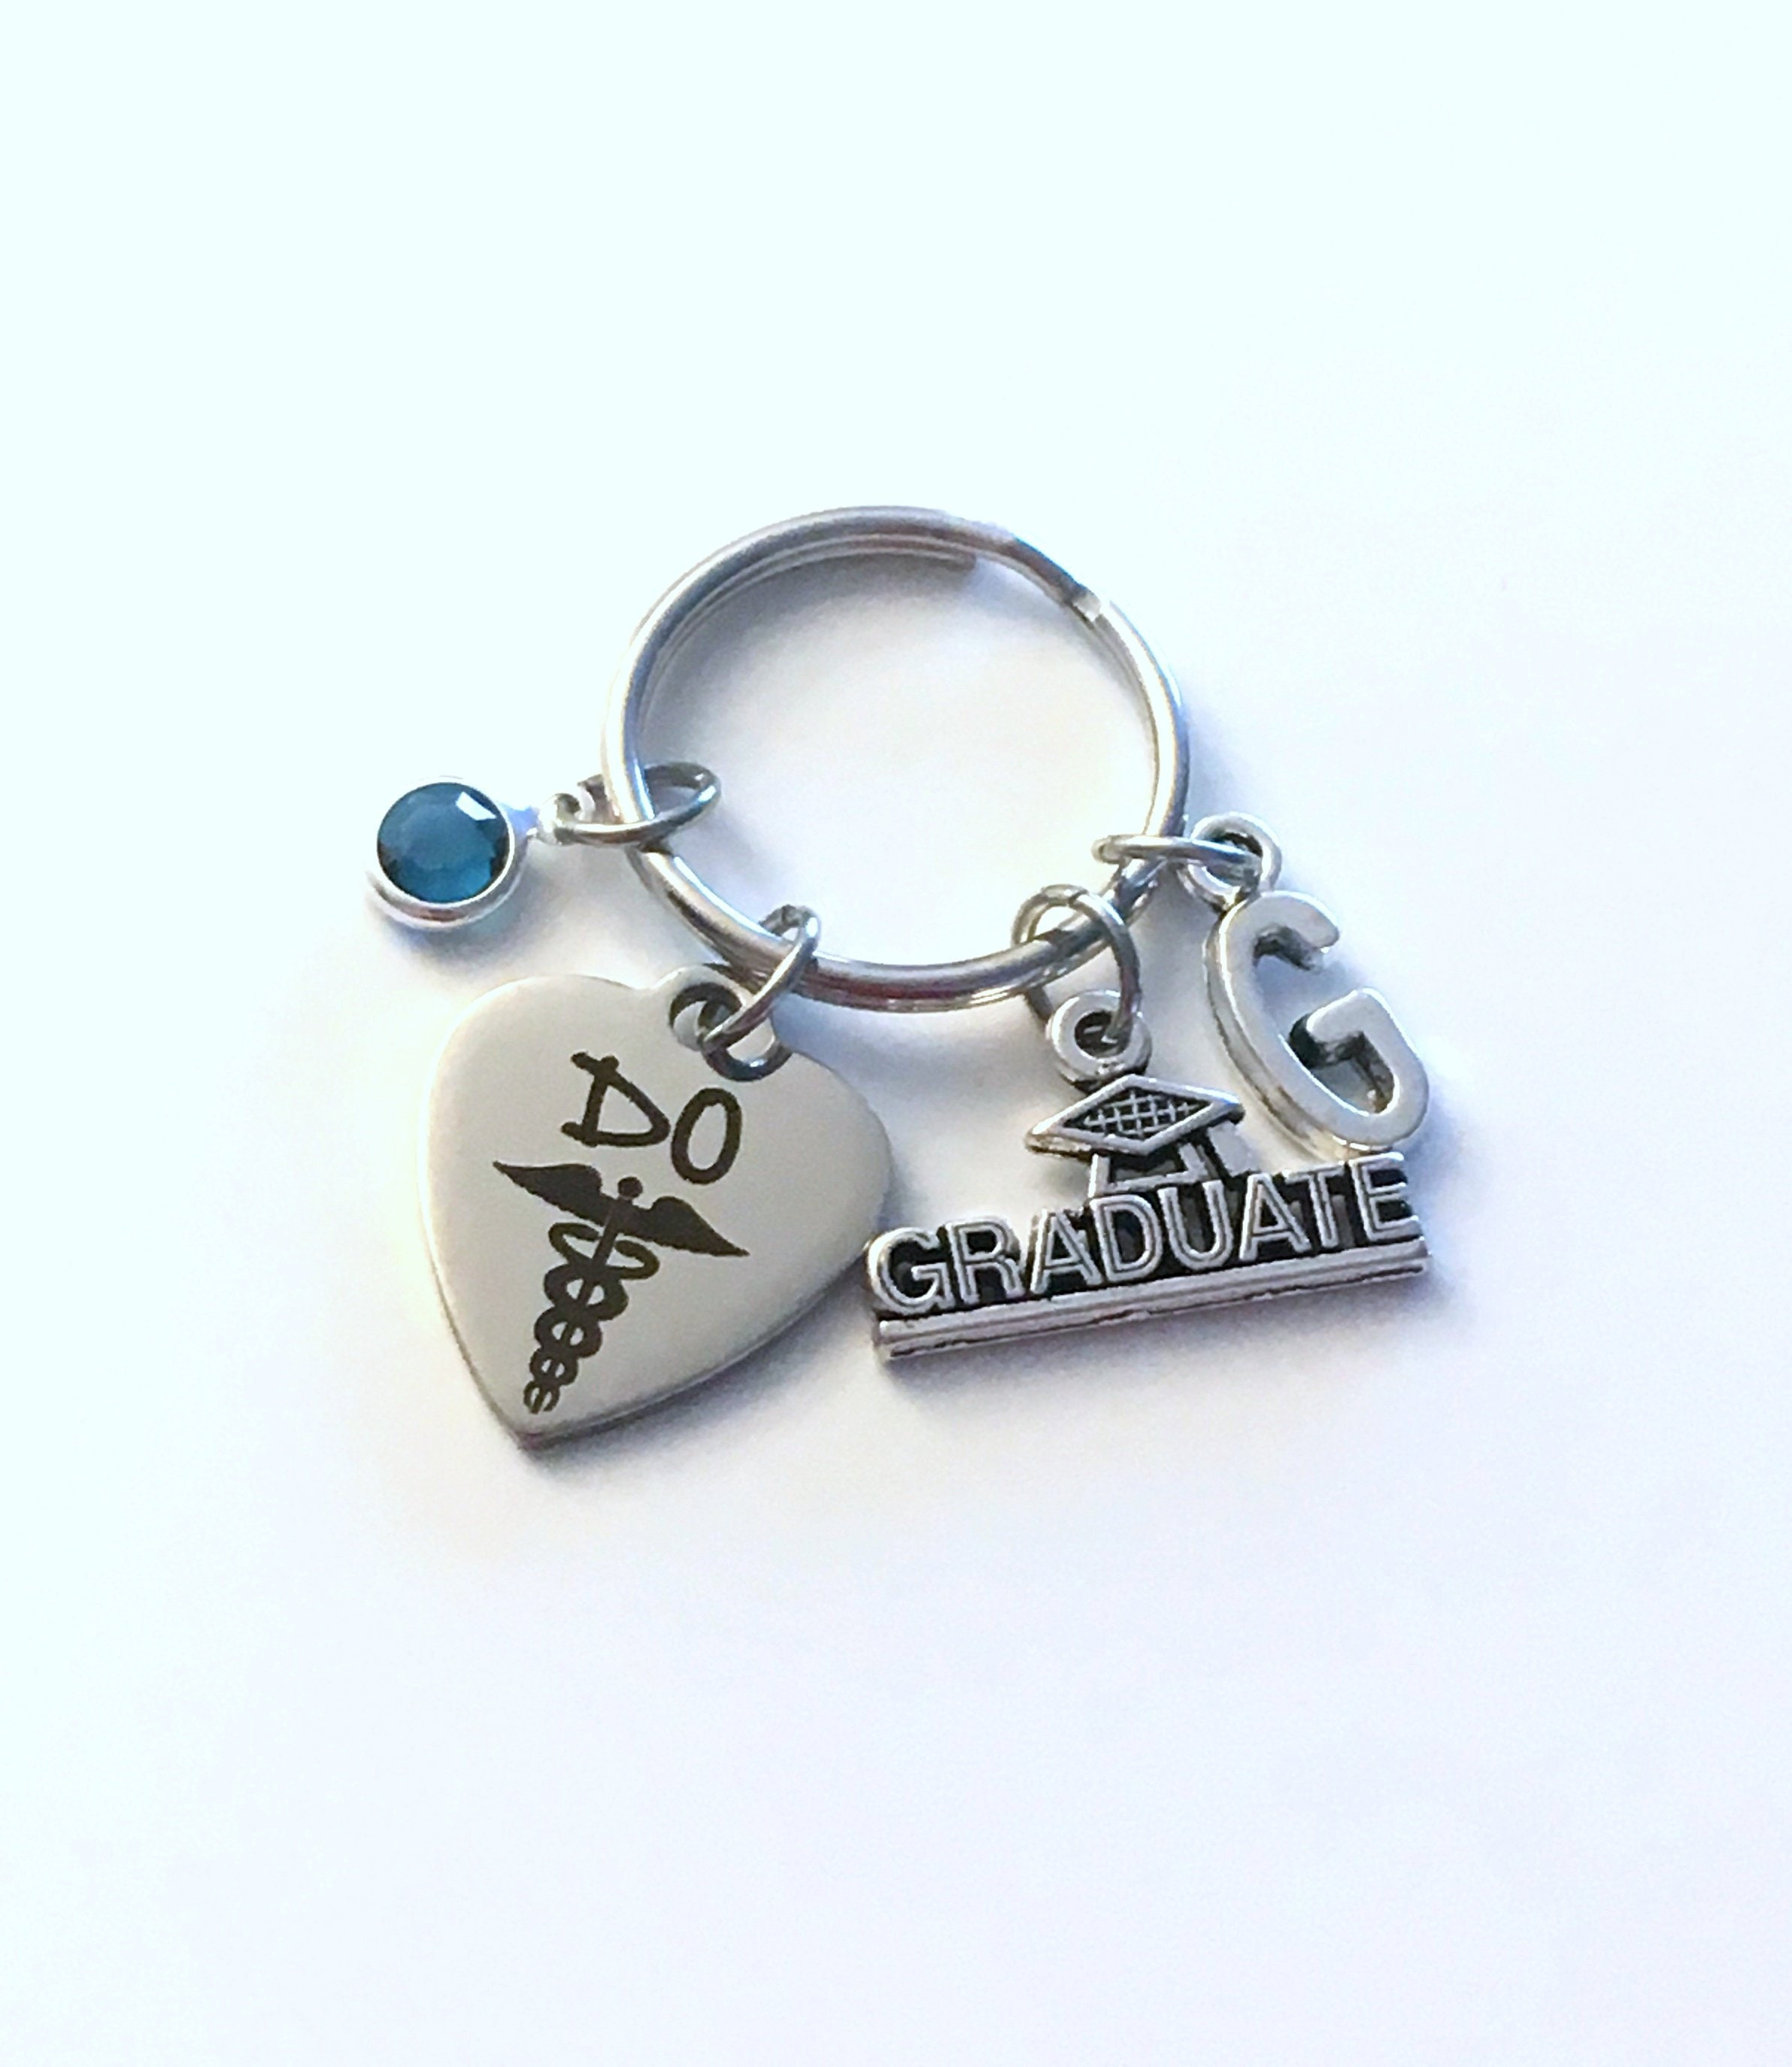 Graduation Present for Osteopath Key Chain 8fcf260452